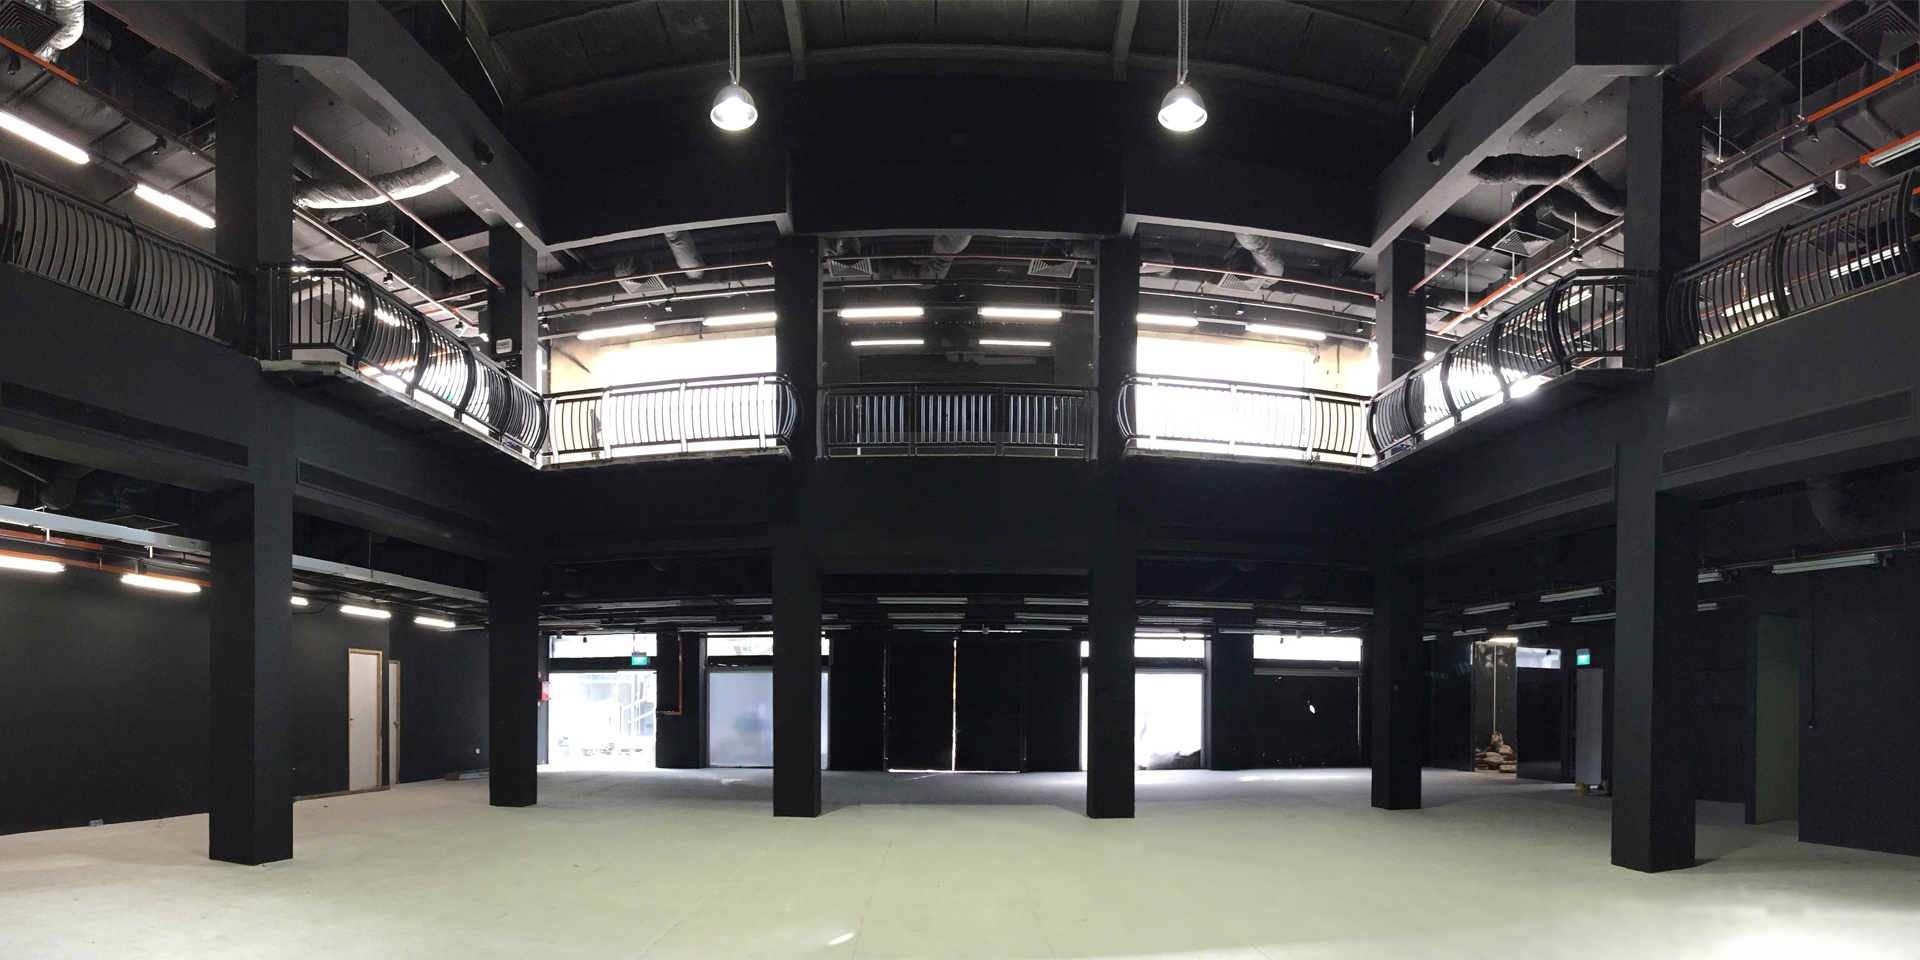 Esplanade opens new live music venue, Annexe Studio